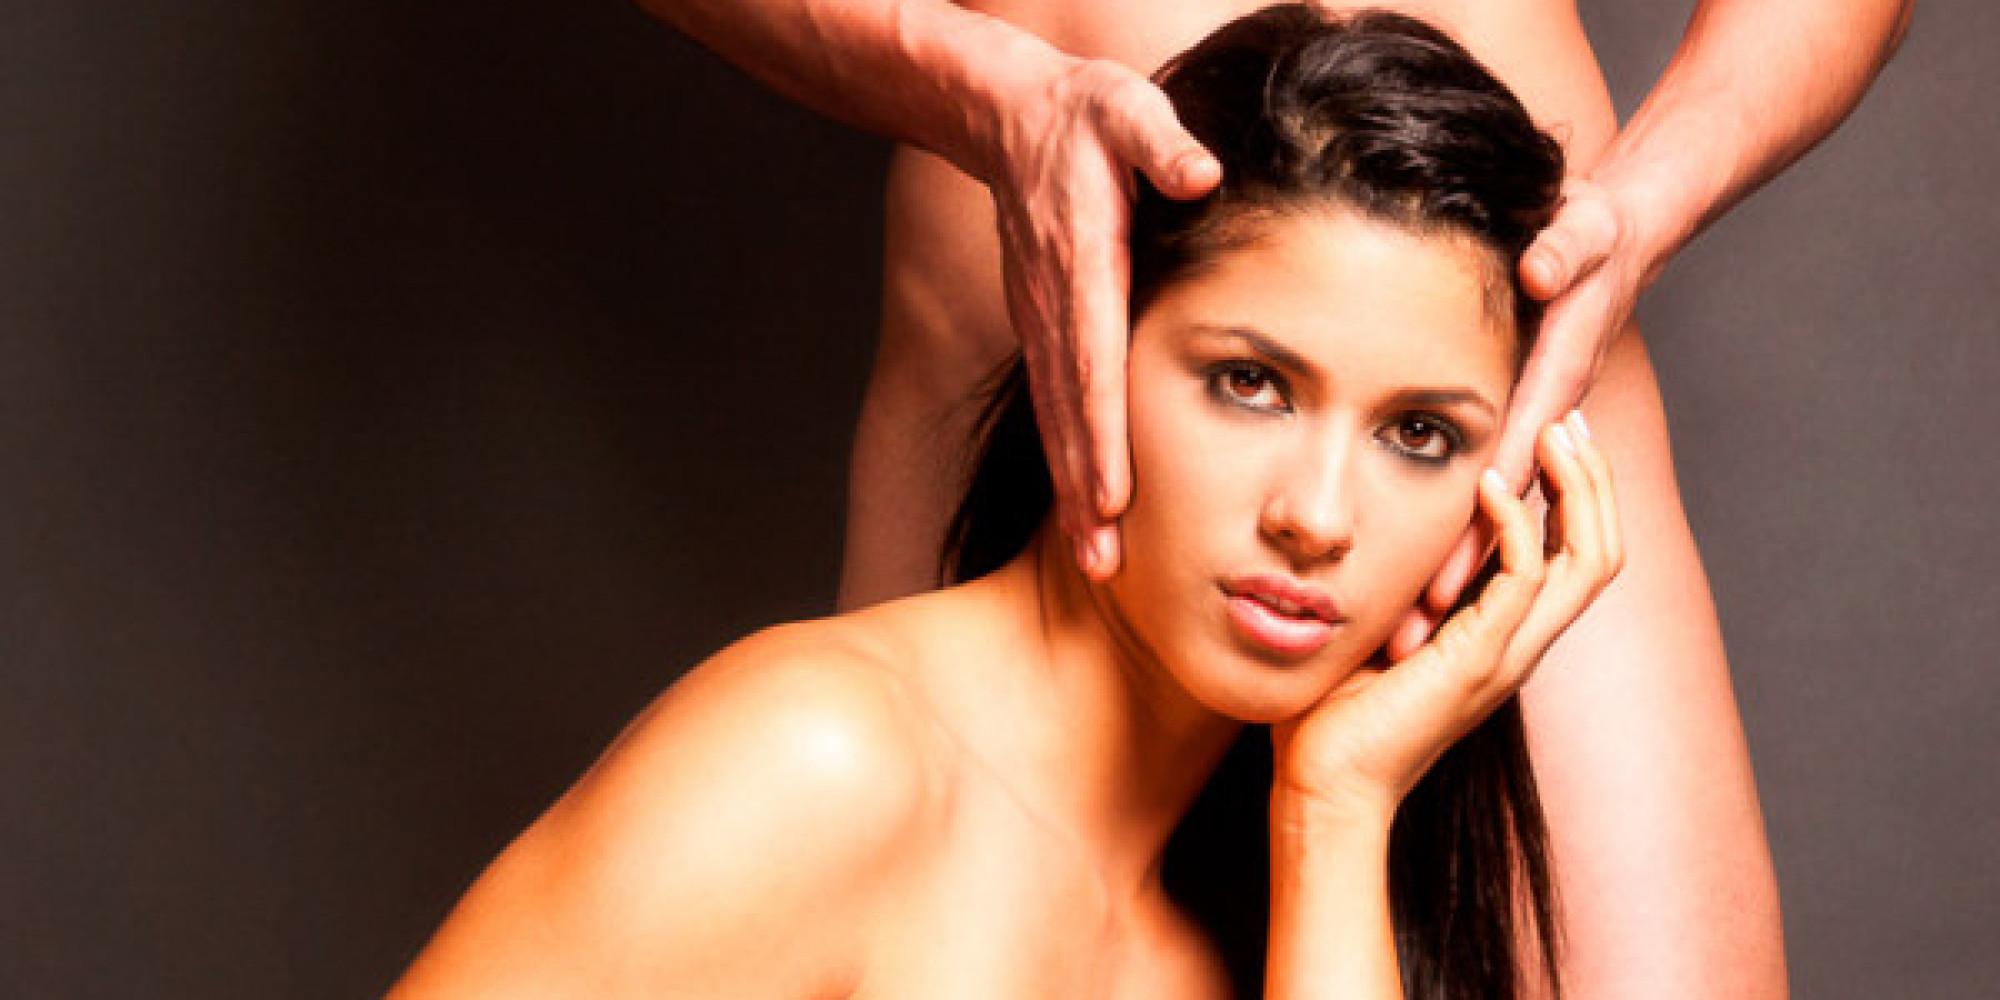 Miss venezuela desnuda Nude Photos 69